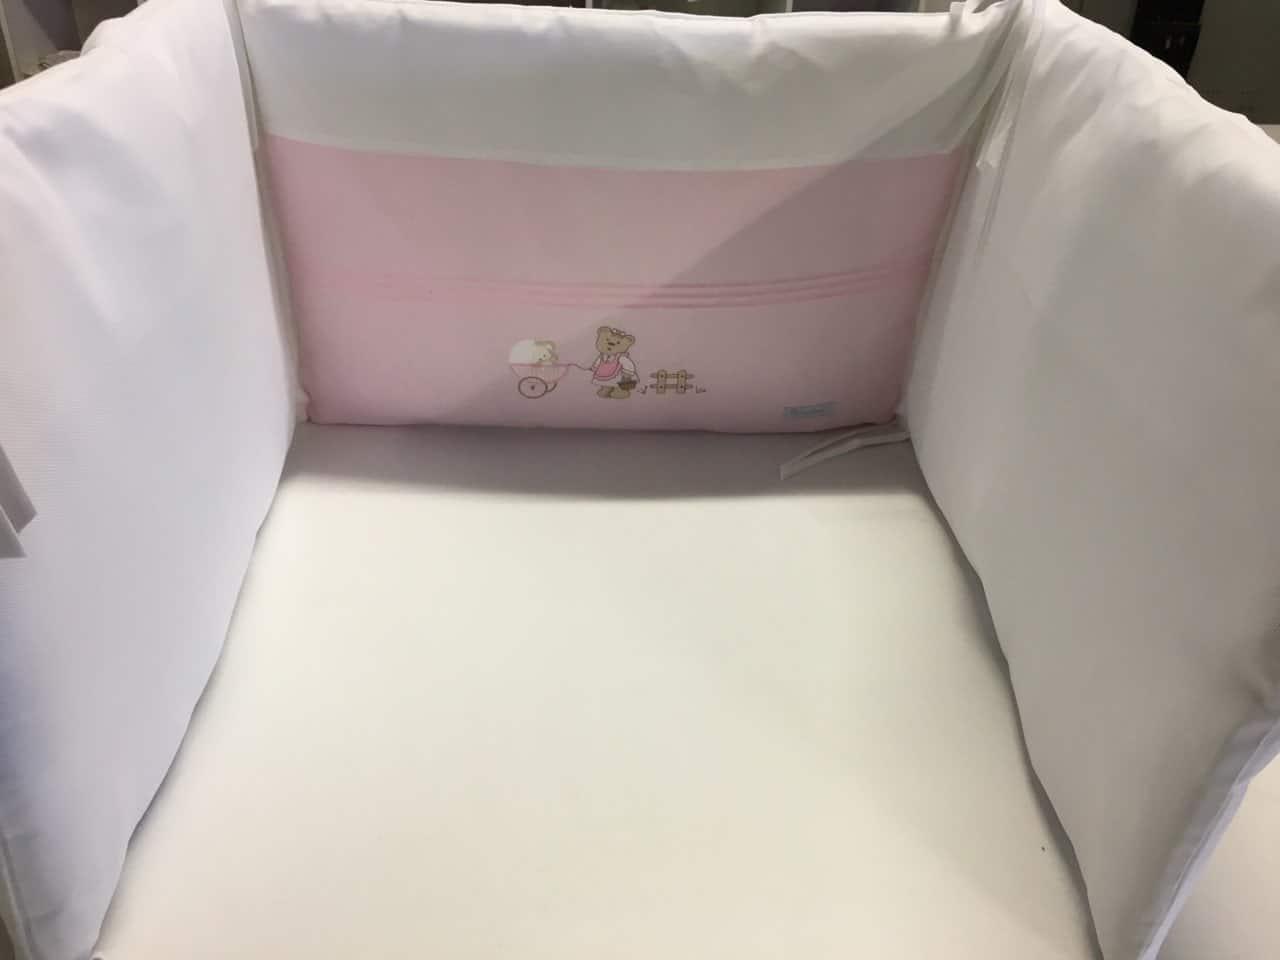 tour de lit ballade rose